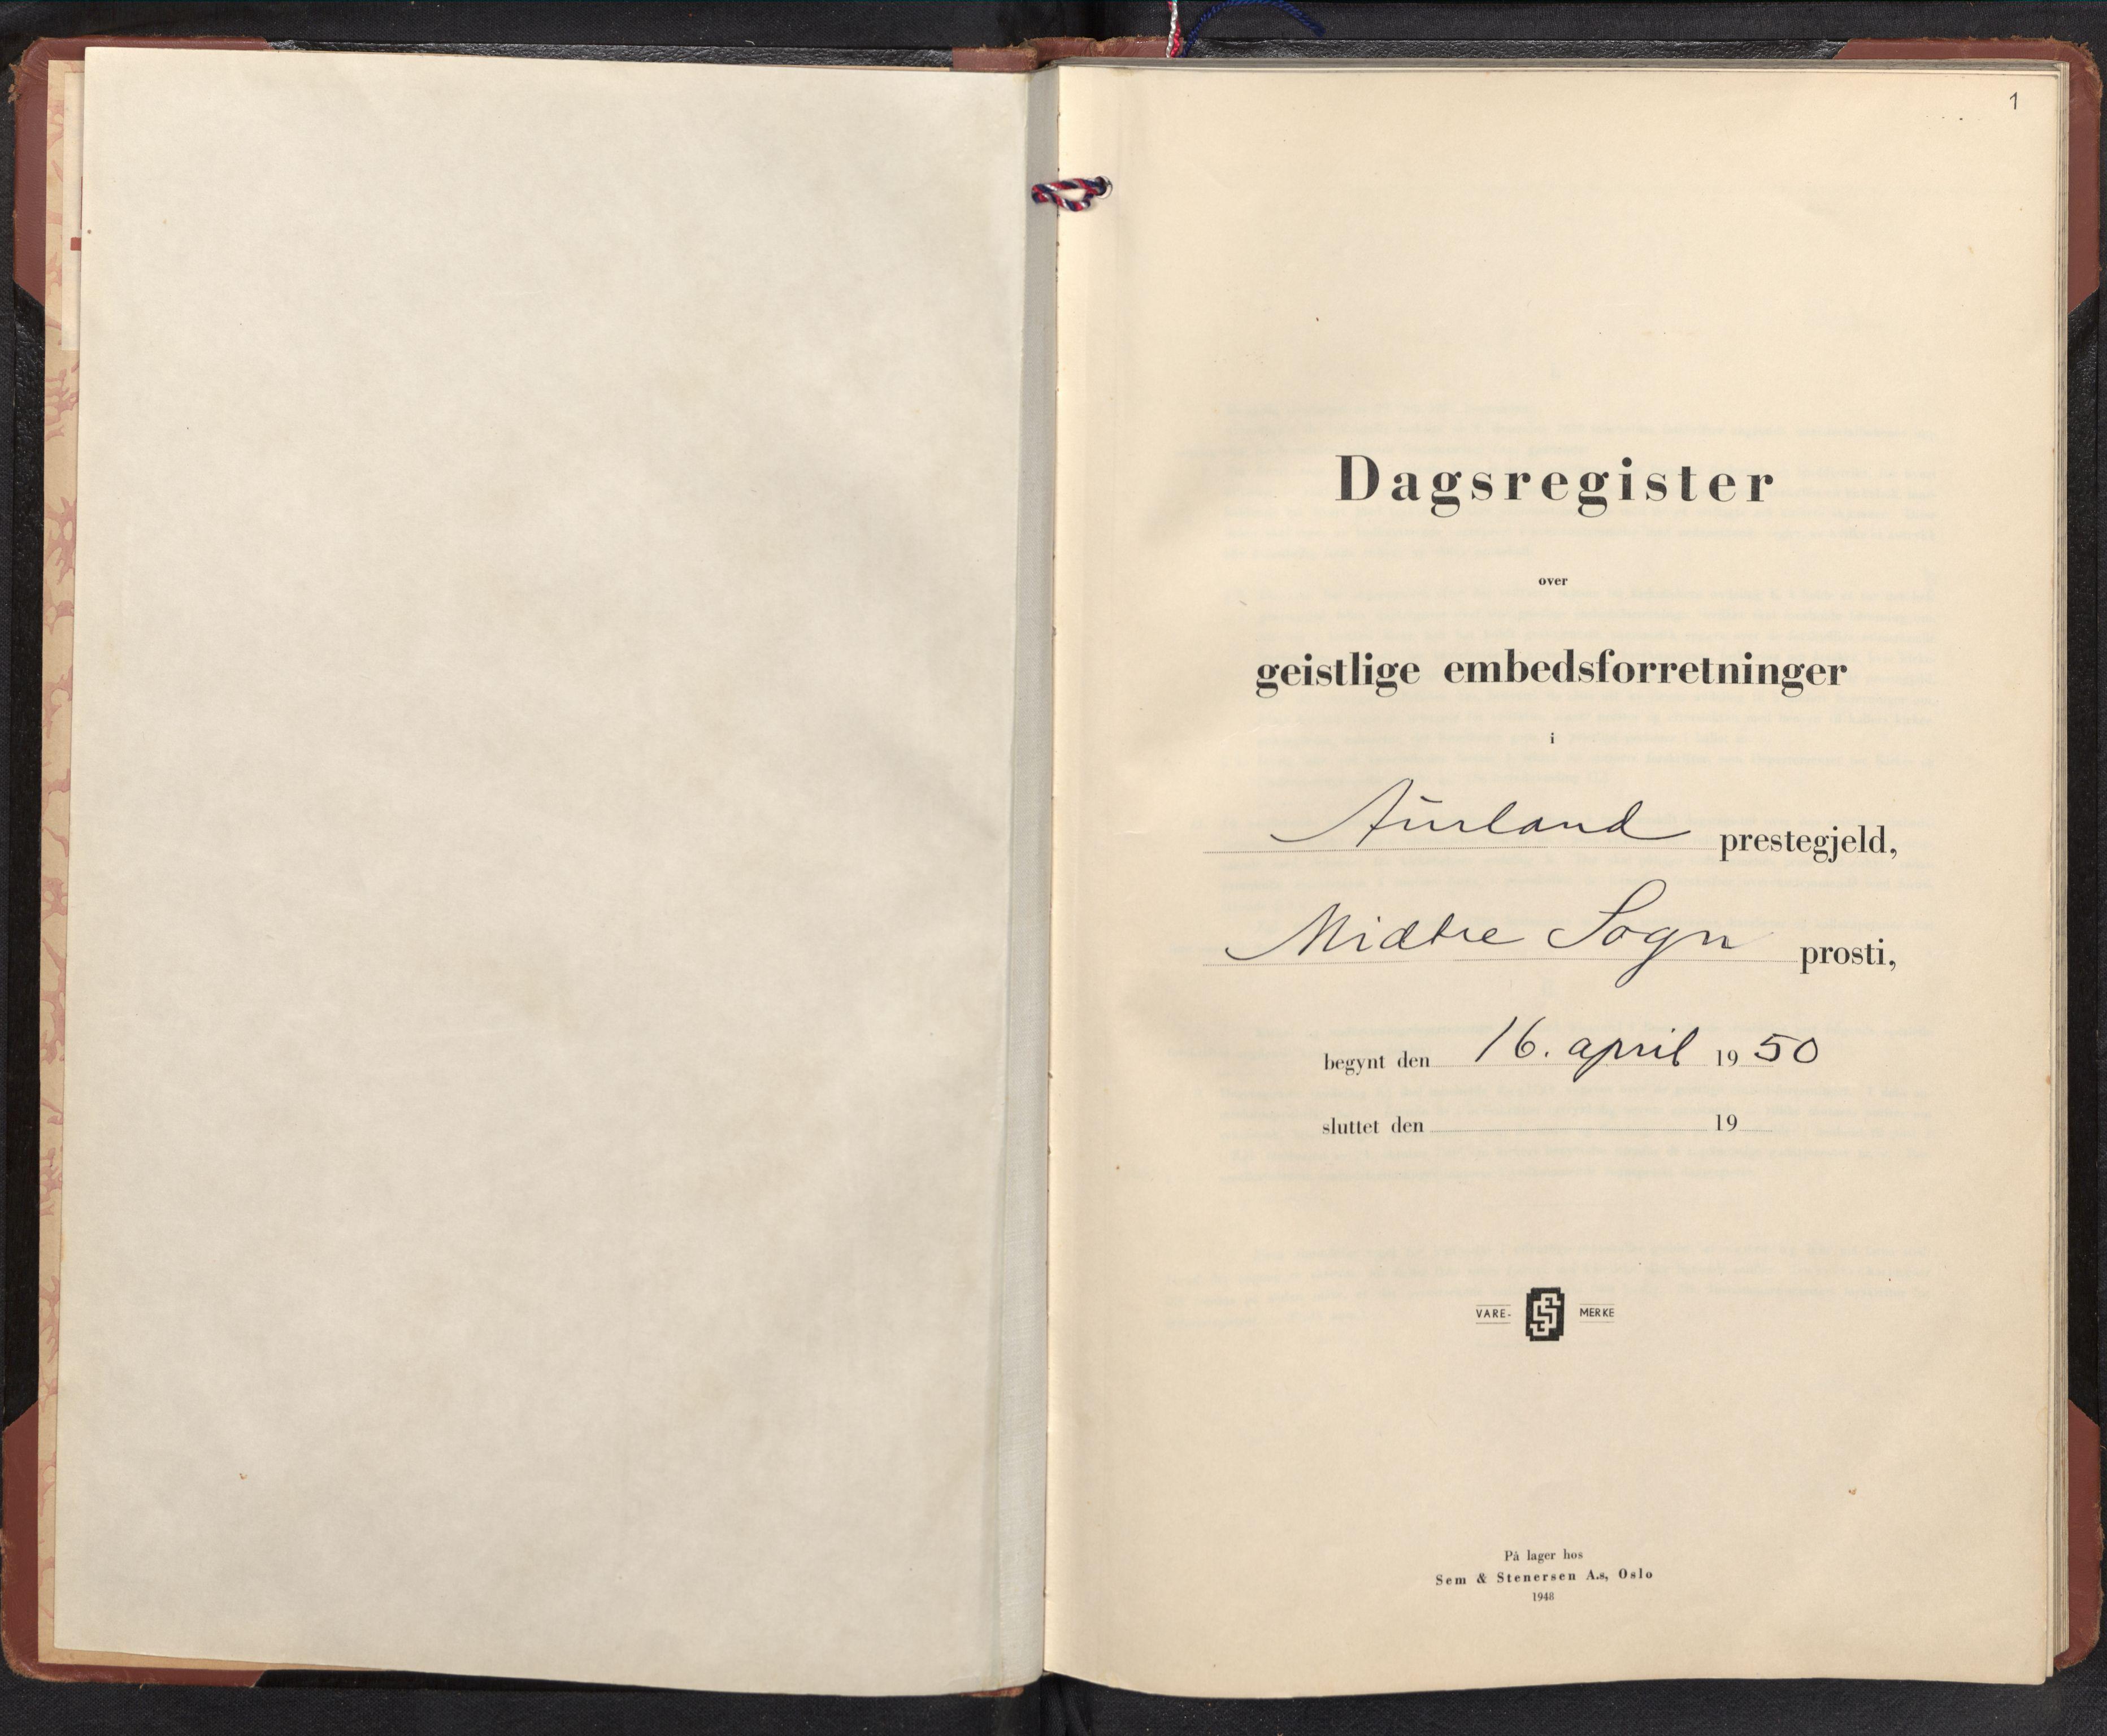 SAB, Aurland Sokneprestembete*, Diary records no. F 4, 1950-1965, p. 0b-1a